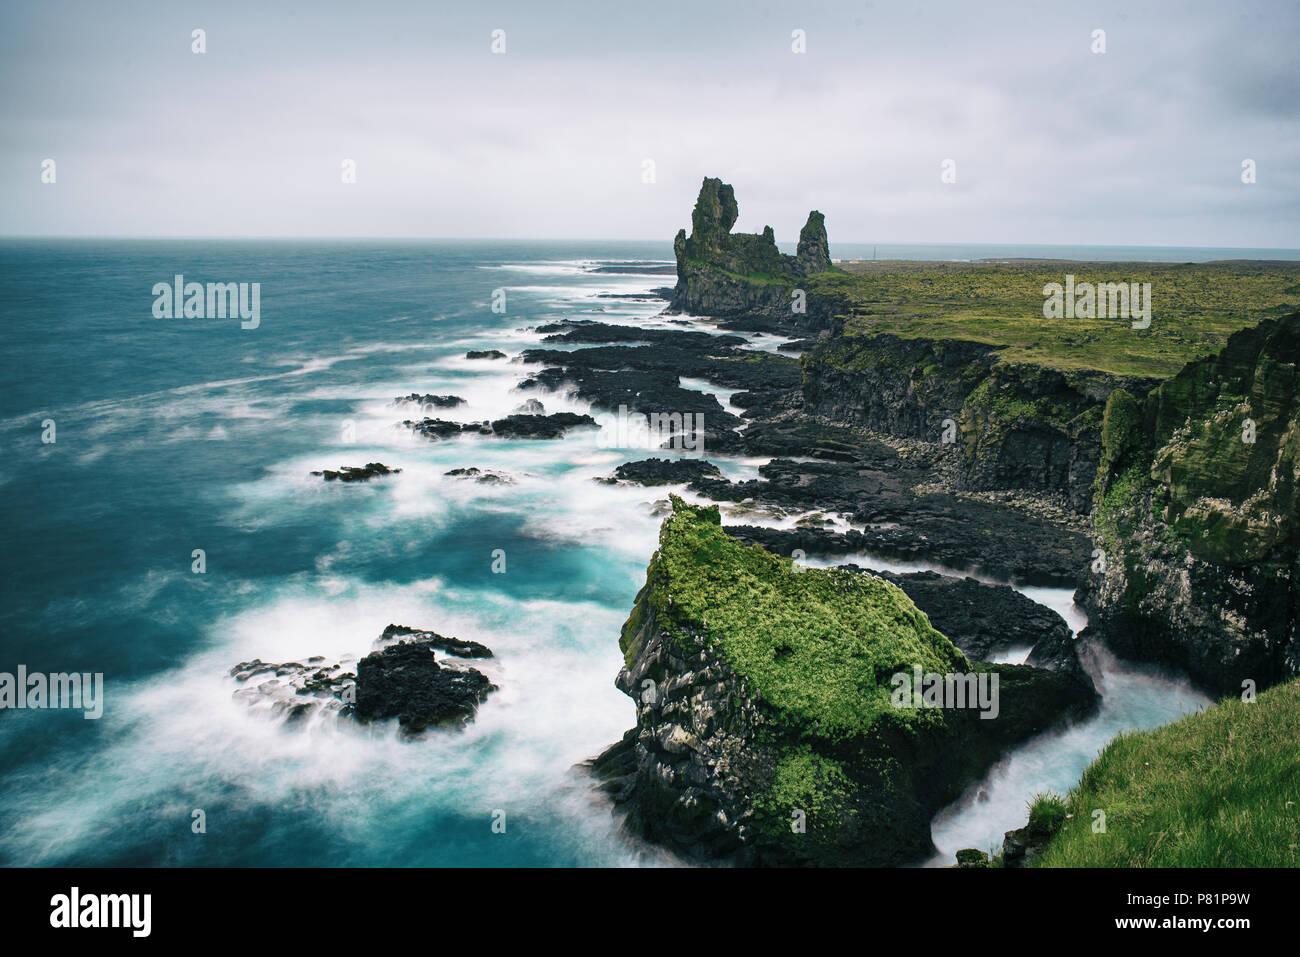 Icland sea landscape - Stock Image